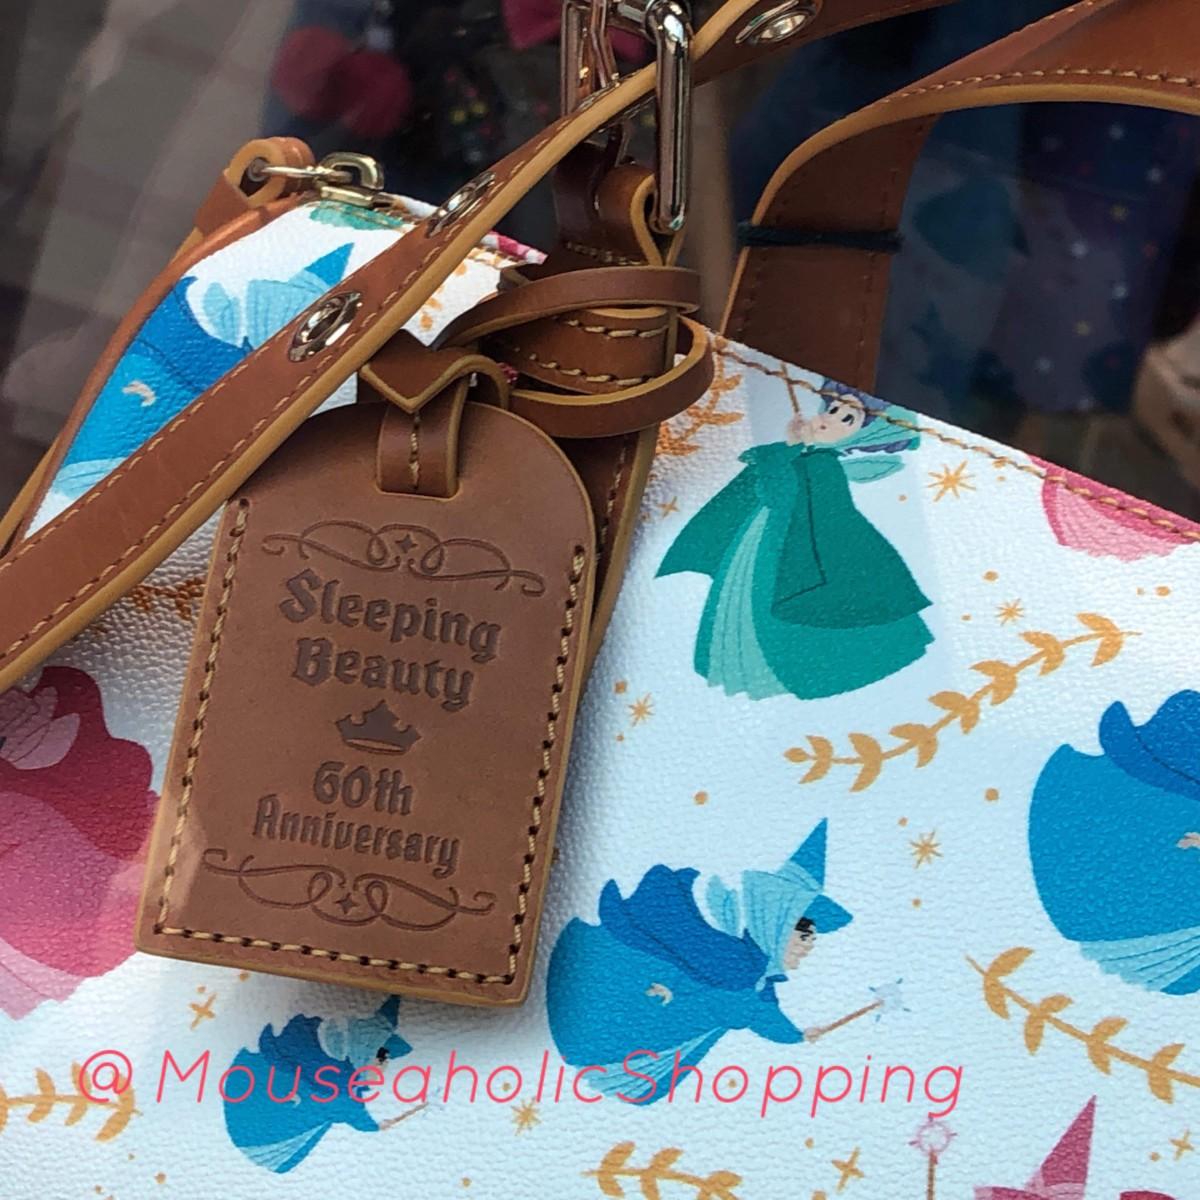 New Sleeping Beauty Dooney and Bourke Bags 4